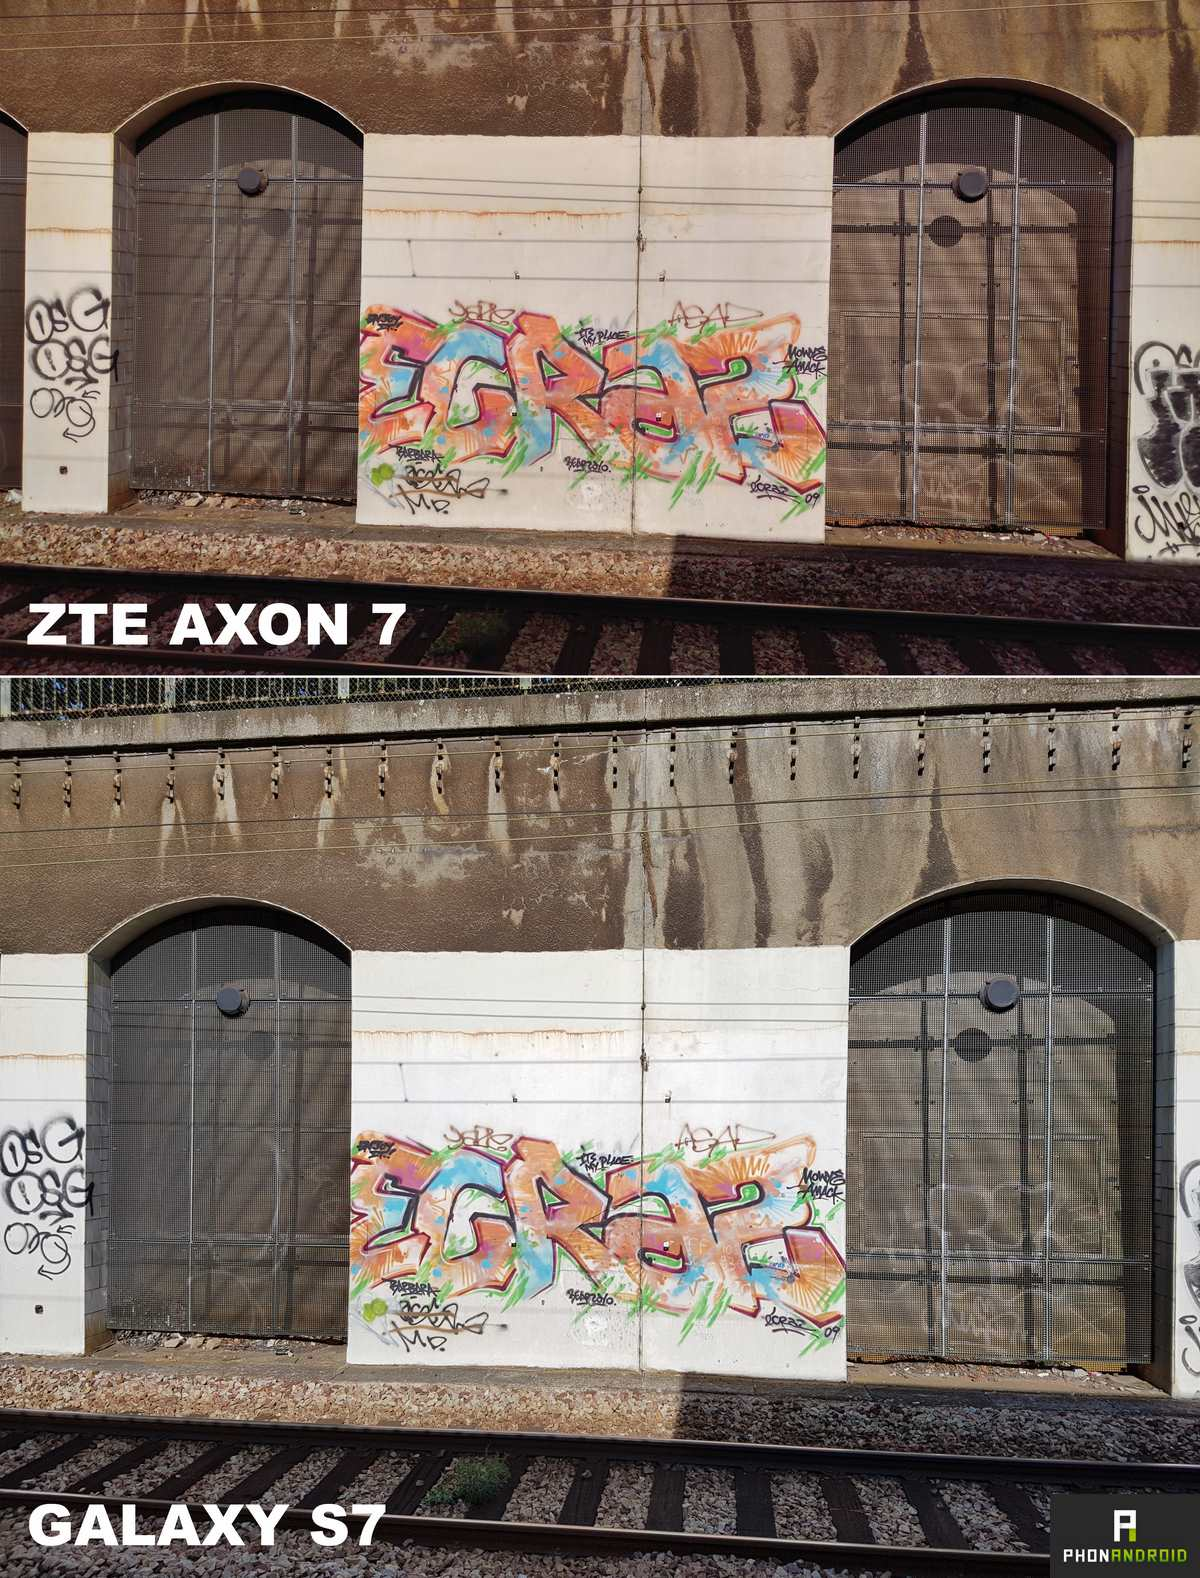 photos zte axon 7